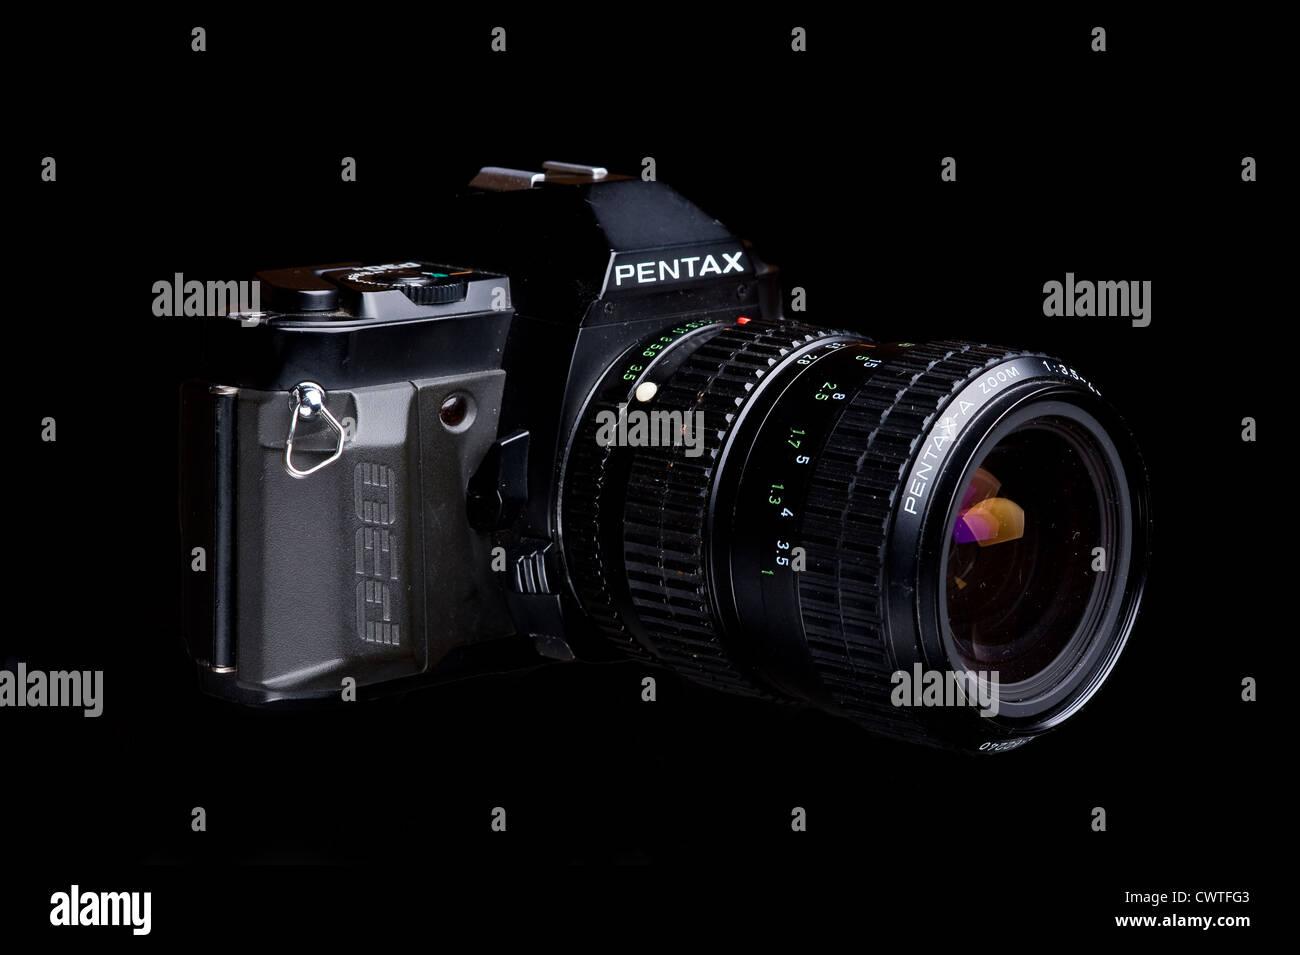 Pentax 35mm film camera. Stock Photo